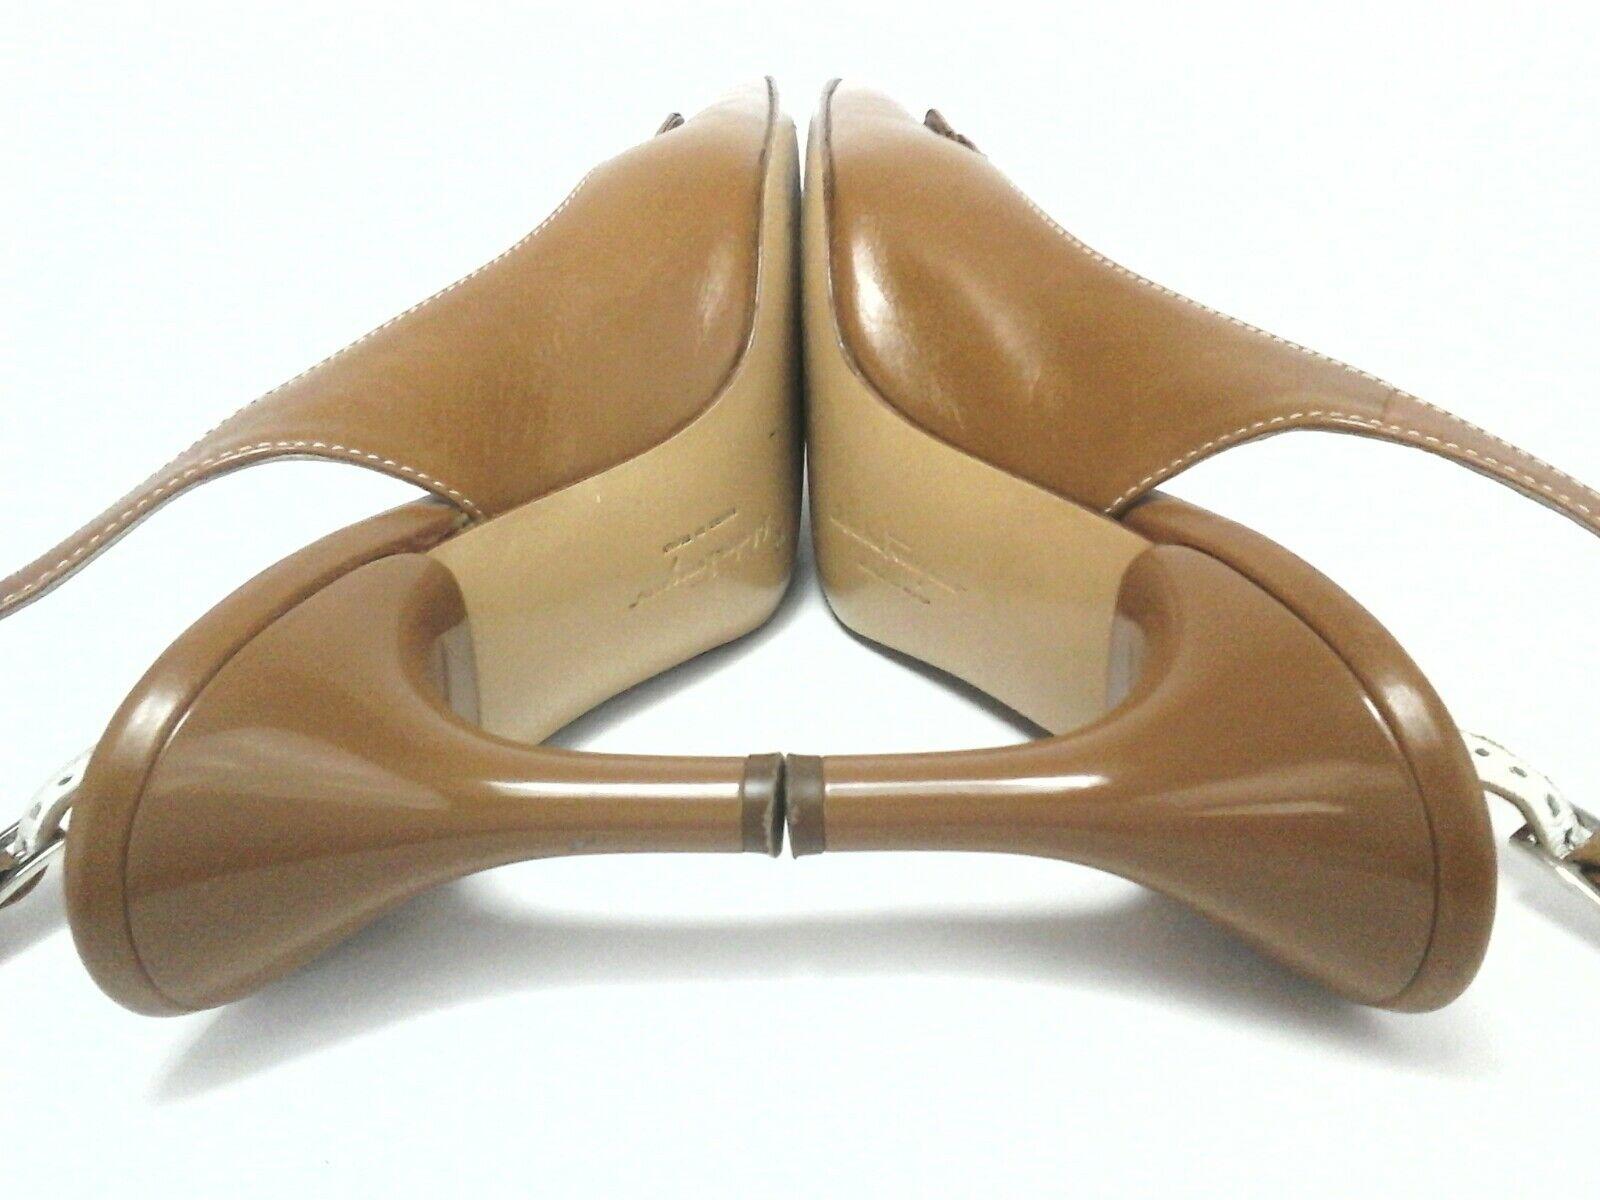 SALVATORRE FERRAGAMO FERRAGAMO FERRAGAMO Heels Pumps Tan Brown GANCINI BIT US 8 8.5 AA EU.39  675 ca1efc